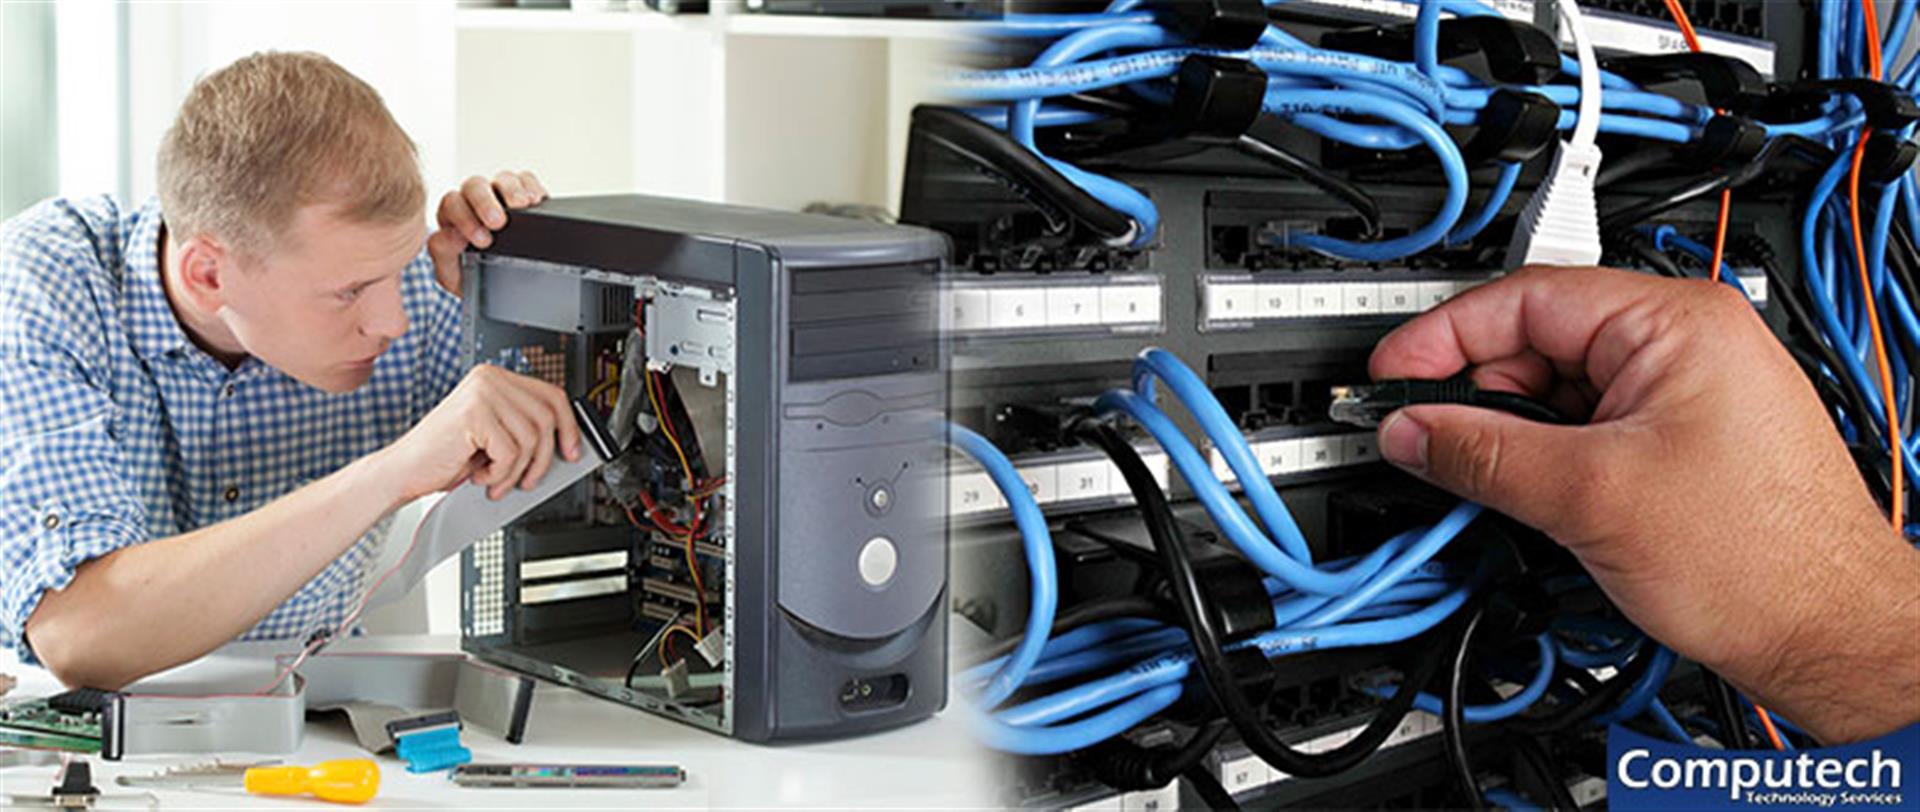 Blacksburg Virginia On Site Computer & Printer Repairs, Networking, Voice & Data Cabling Contractors